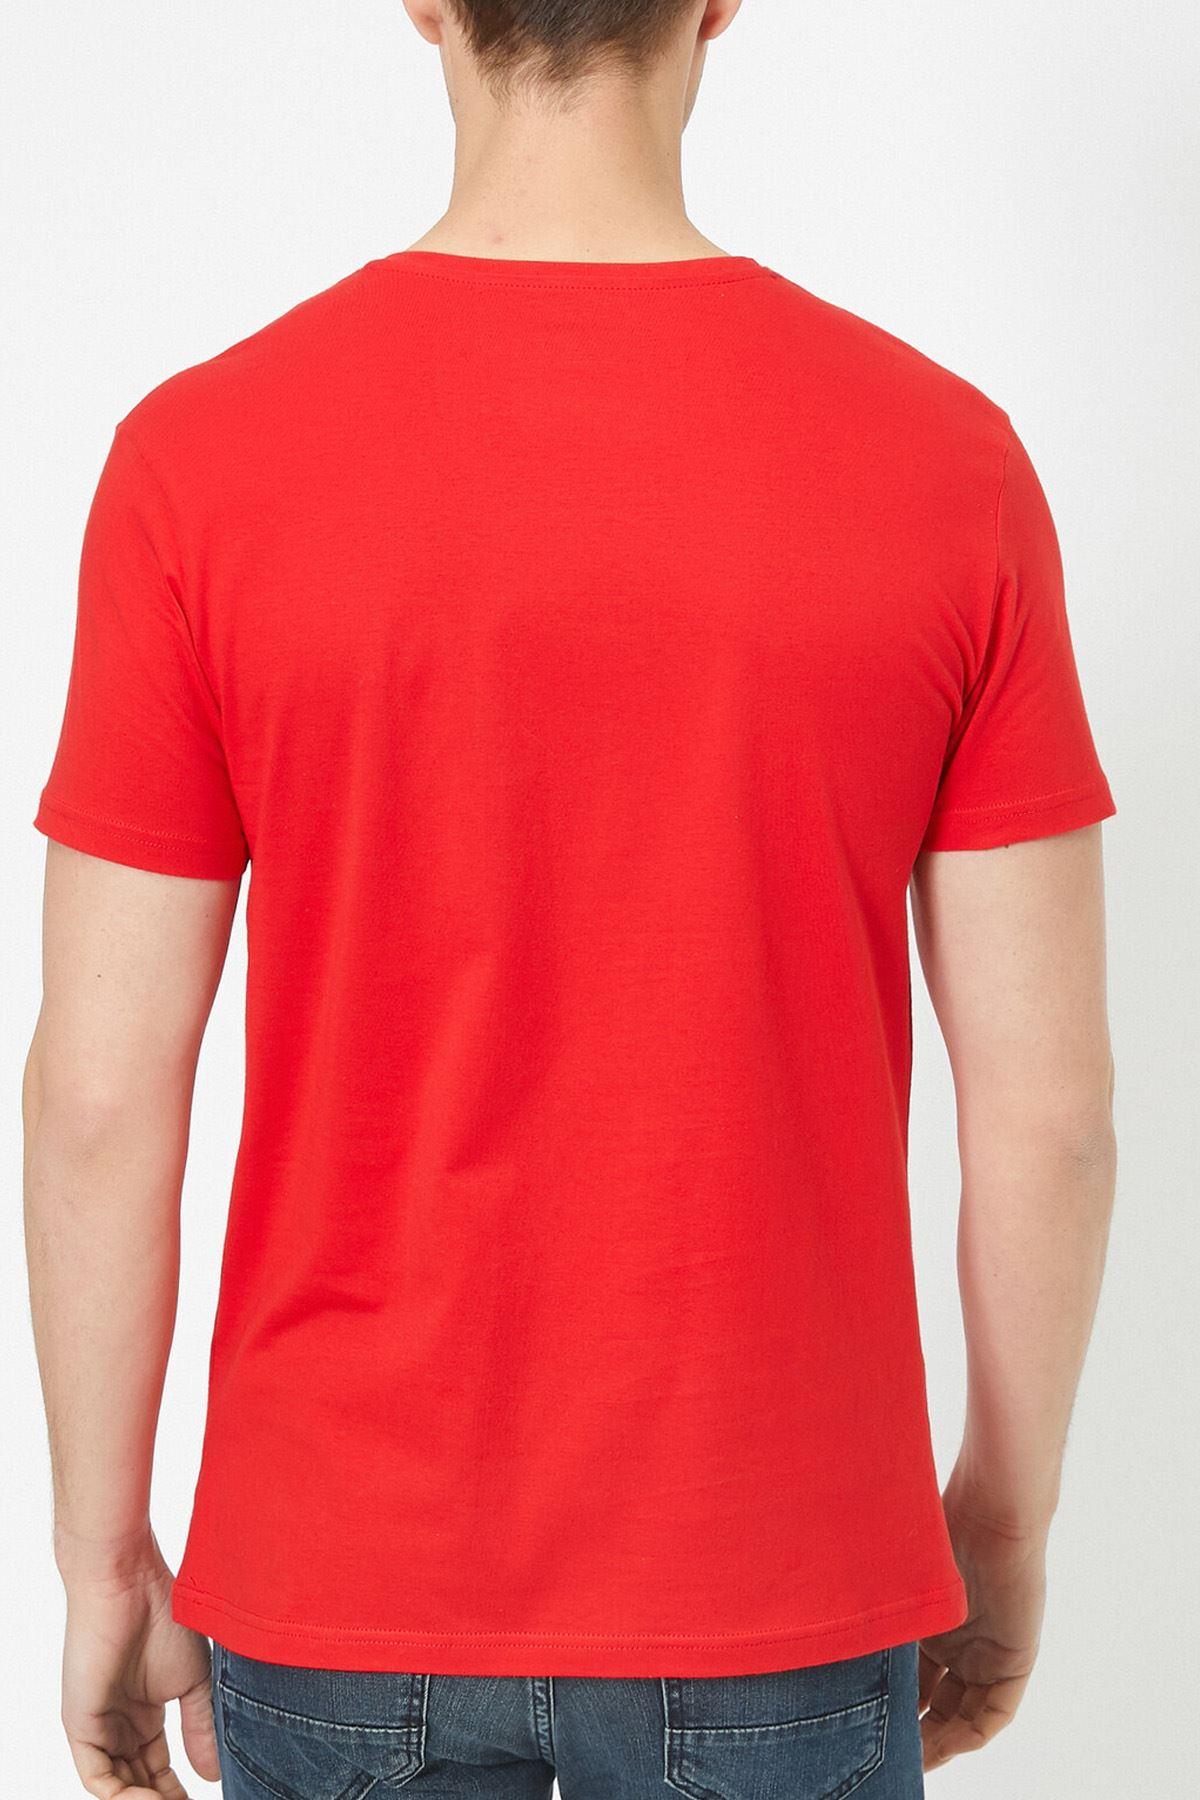 Naruto Anime 01 Kırmızı Erkek Tshirt - Tişört